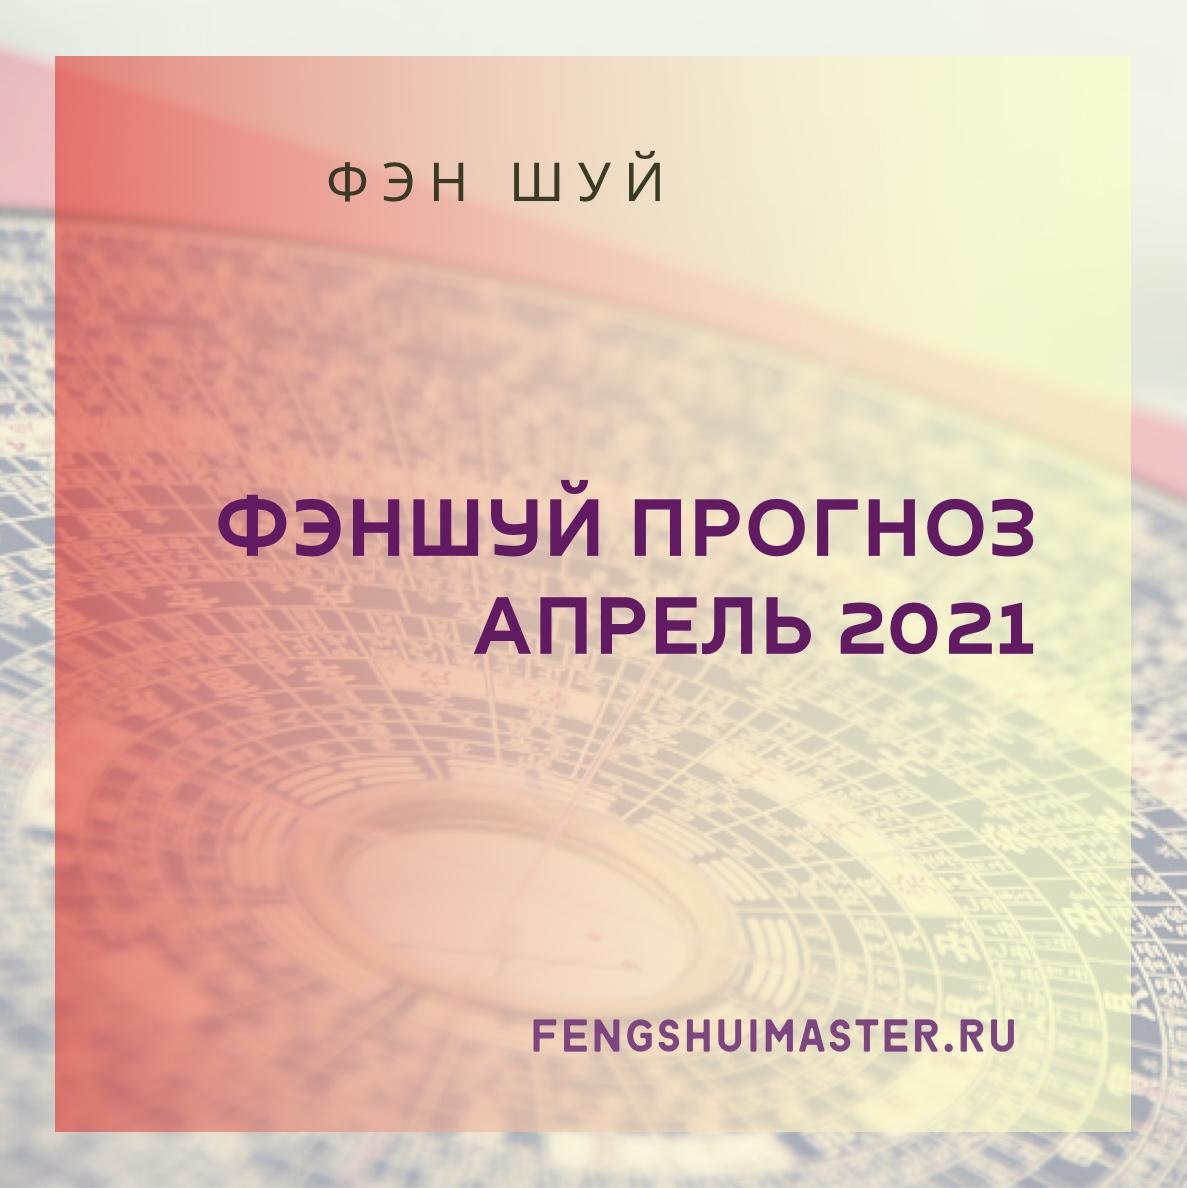 Фэншуй-прогноз апрель 2021 - Fengshuimaster.ru